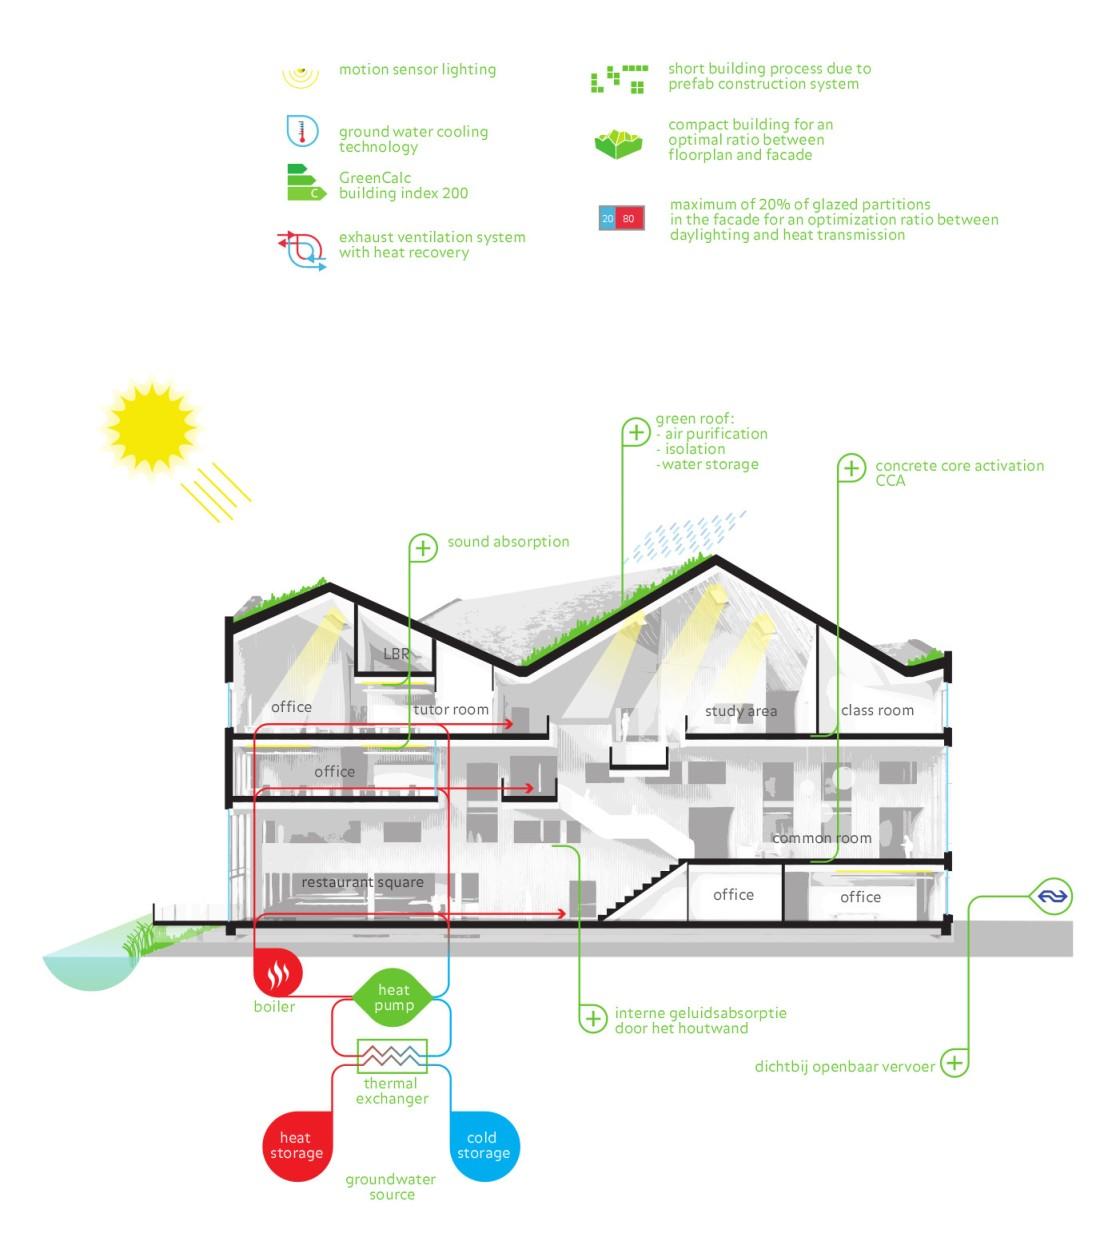 amsterdam-university-college-sustainability